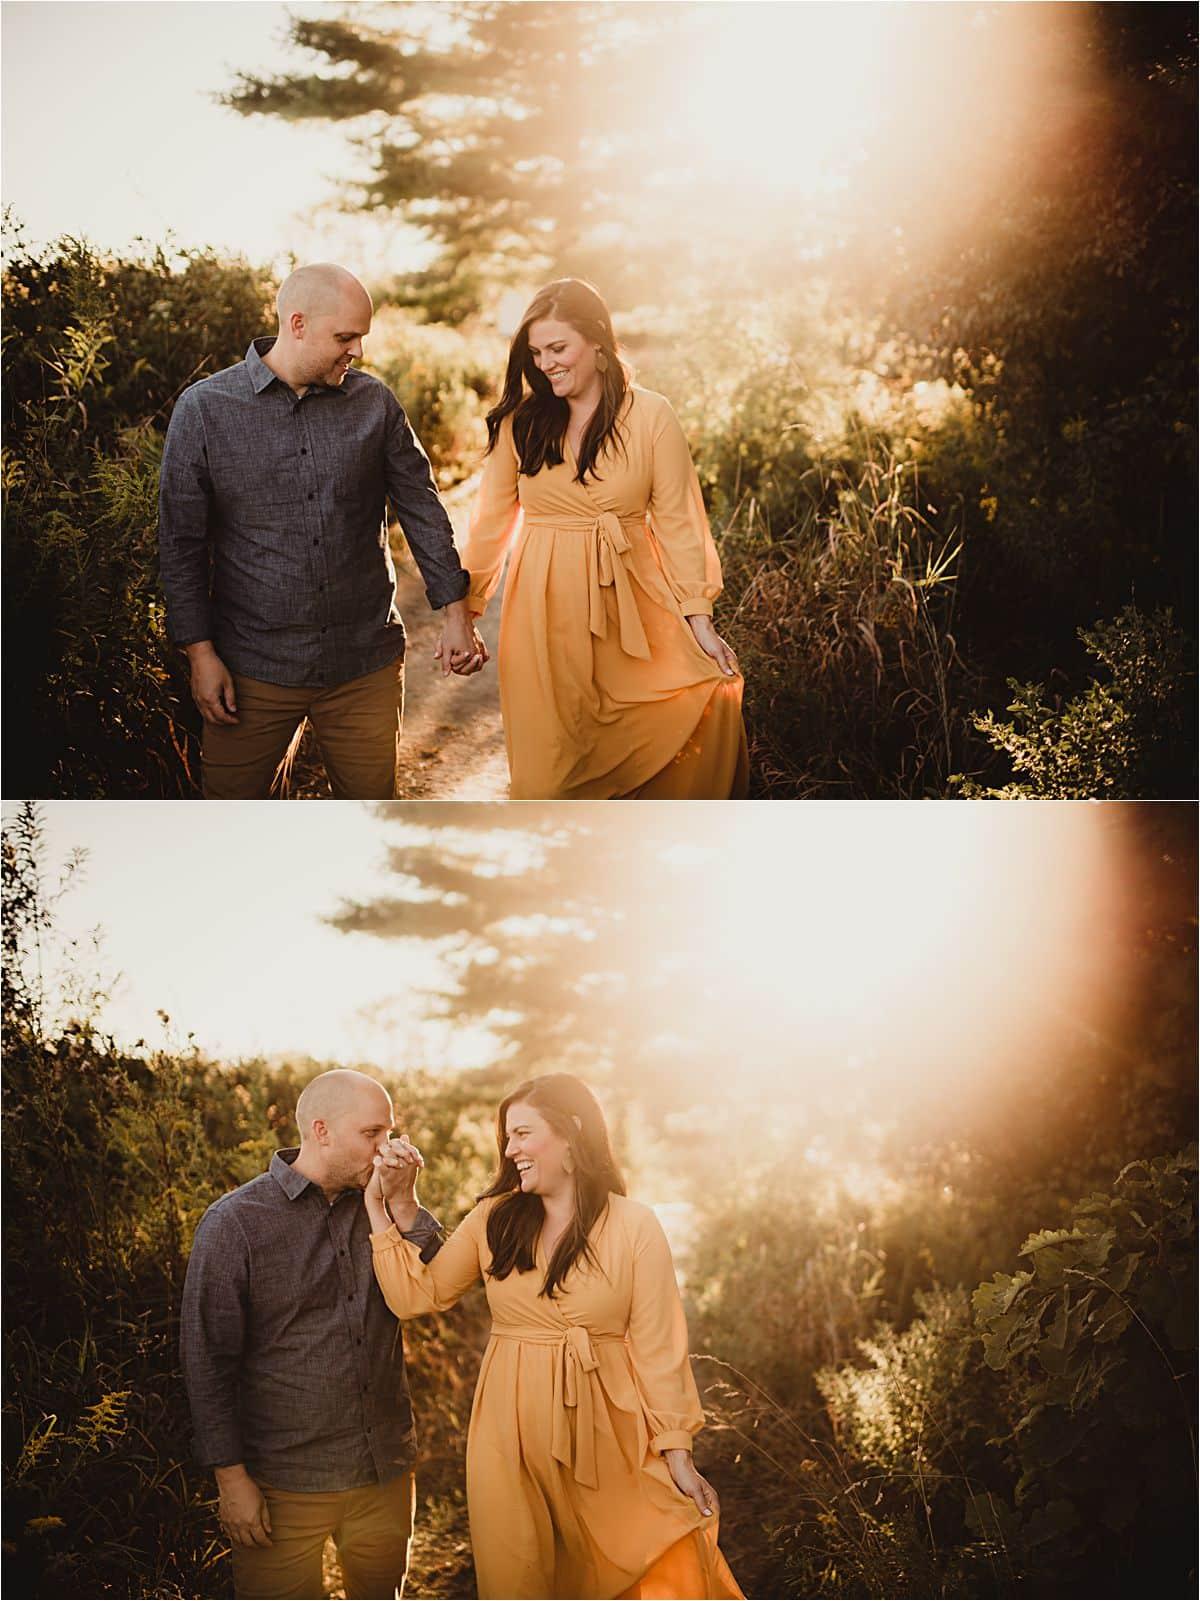 September Sunset Session Couple Walking Holding Hands